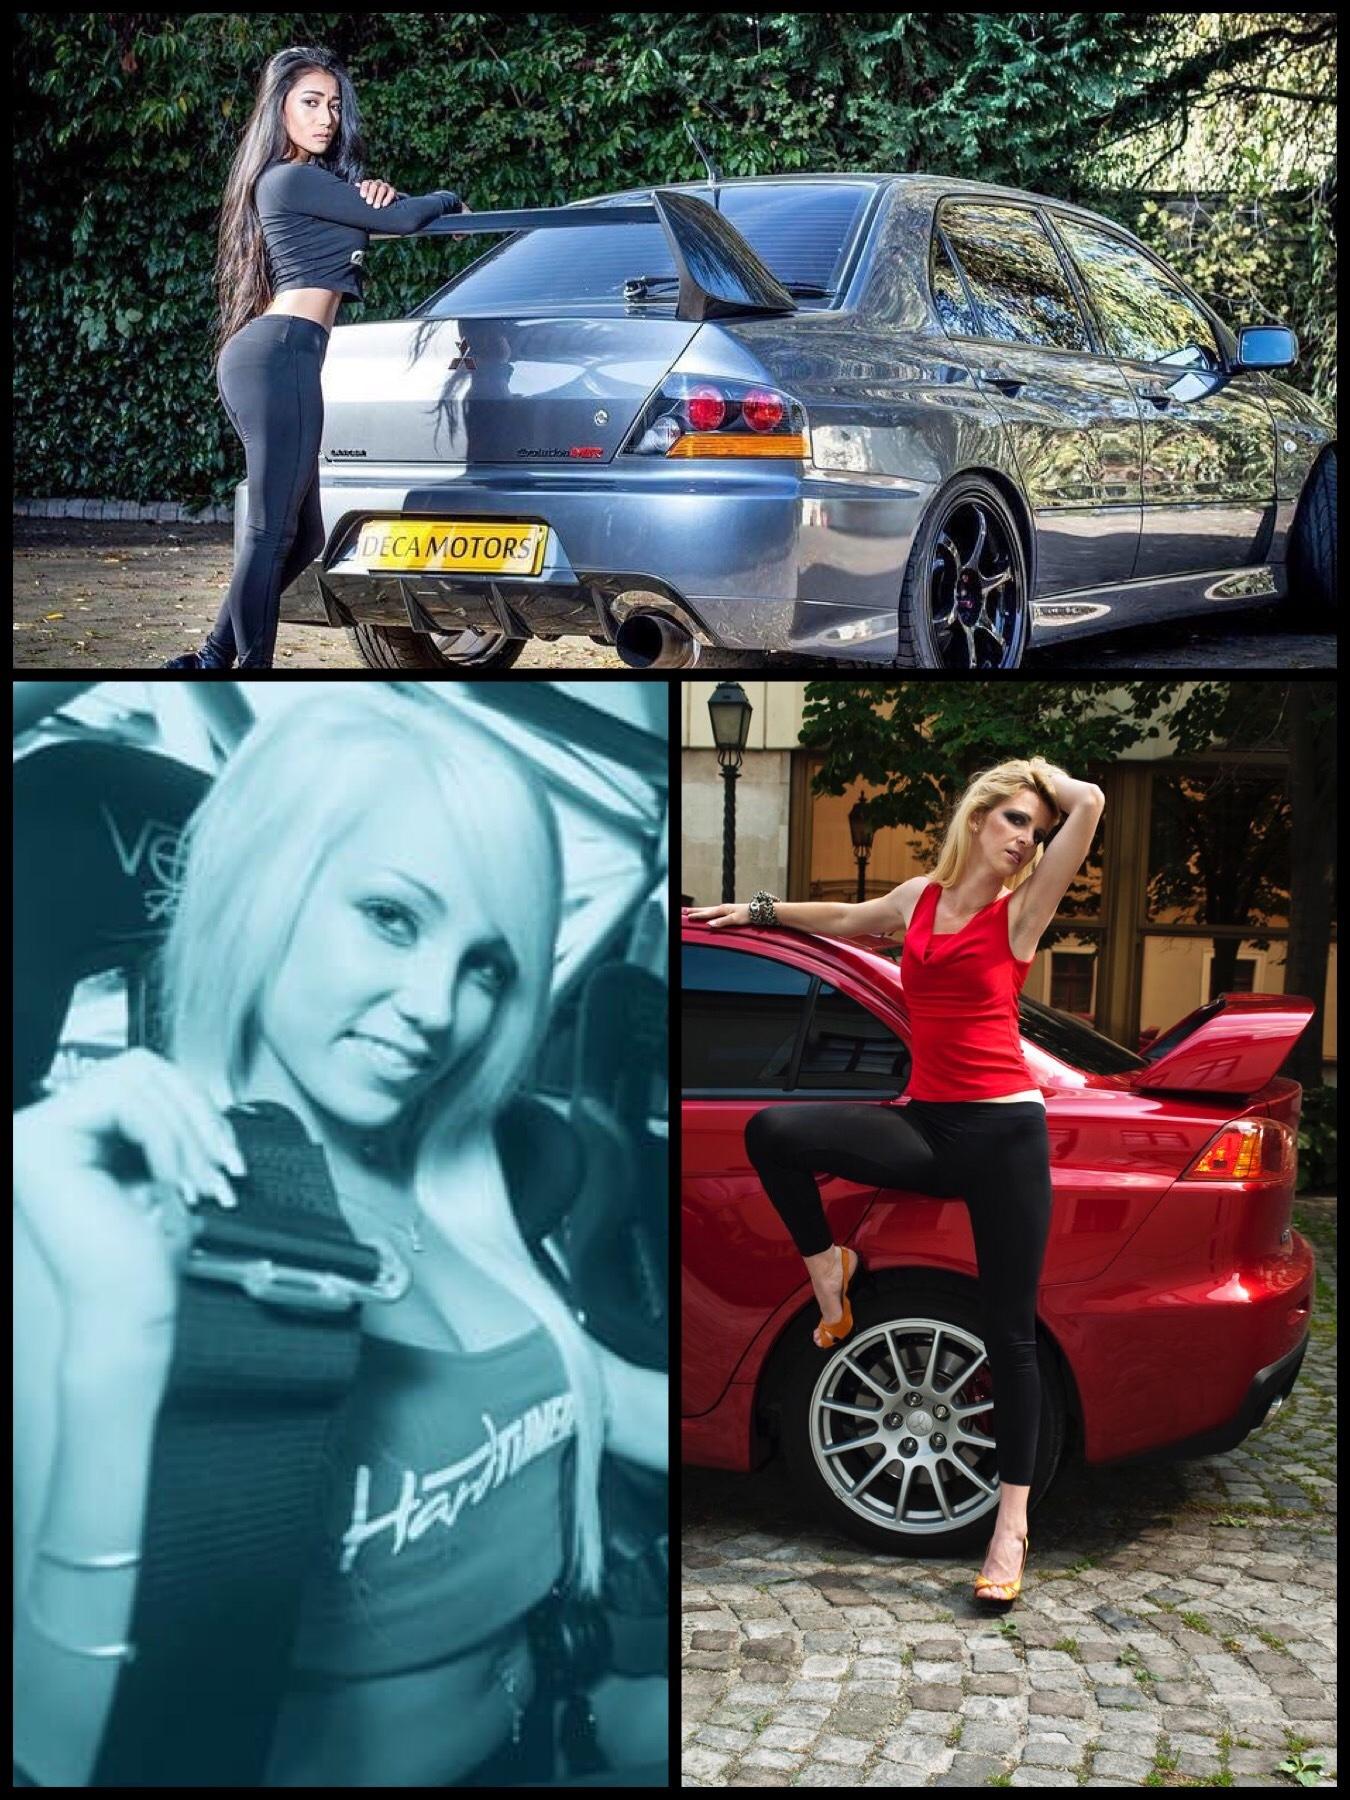 Beautiful women with Mitsubishi mortars cars